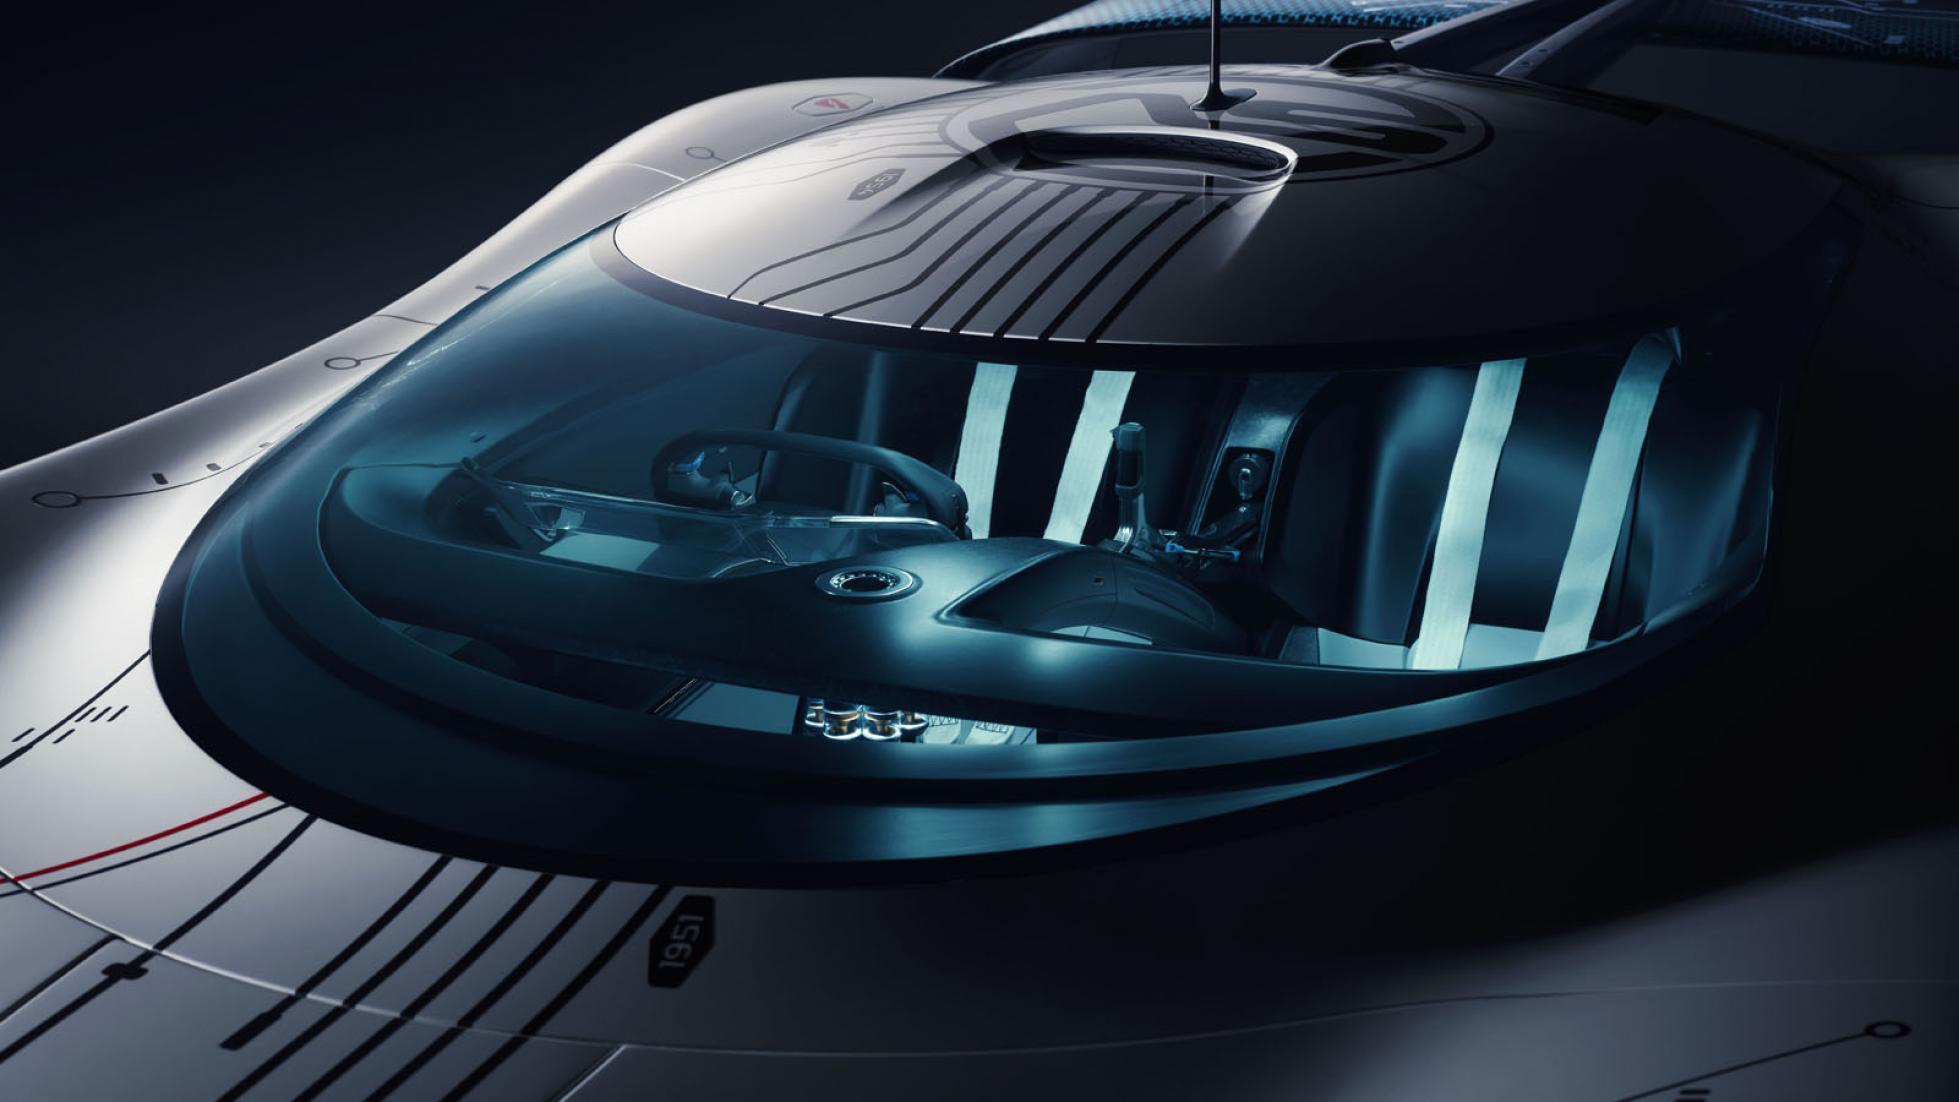 Jaguar Vision GT SV 10 carro elétrico, Gran Turismo, Gran Turismo Sport, GT, Jaguar, Jaguar Vision GT SV